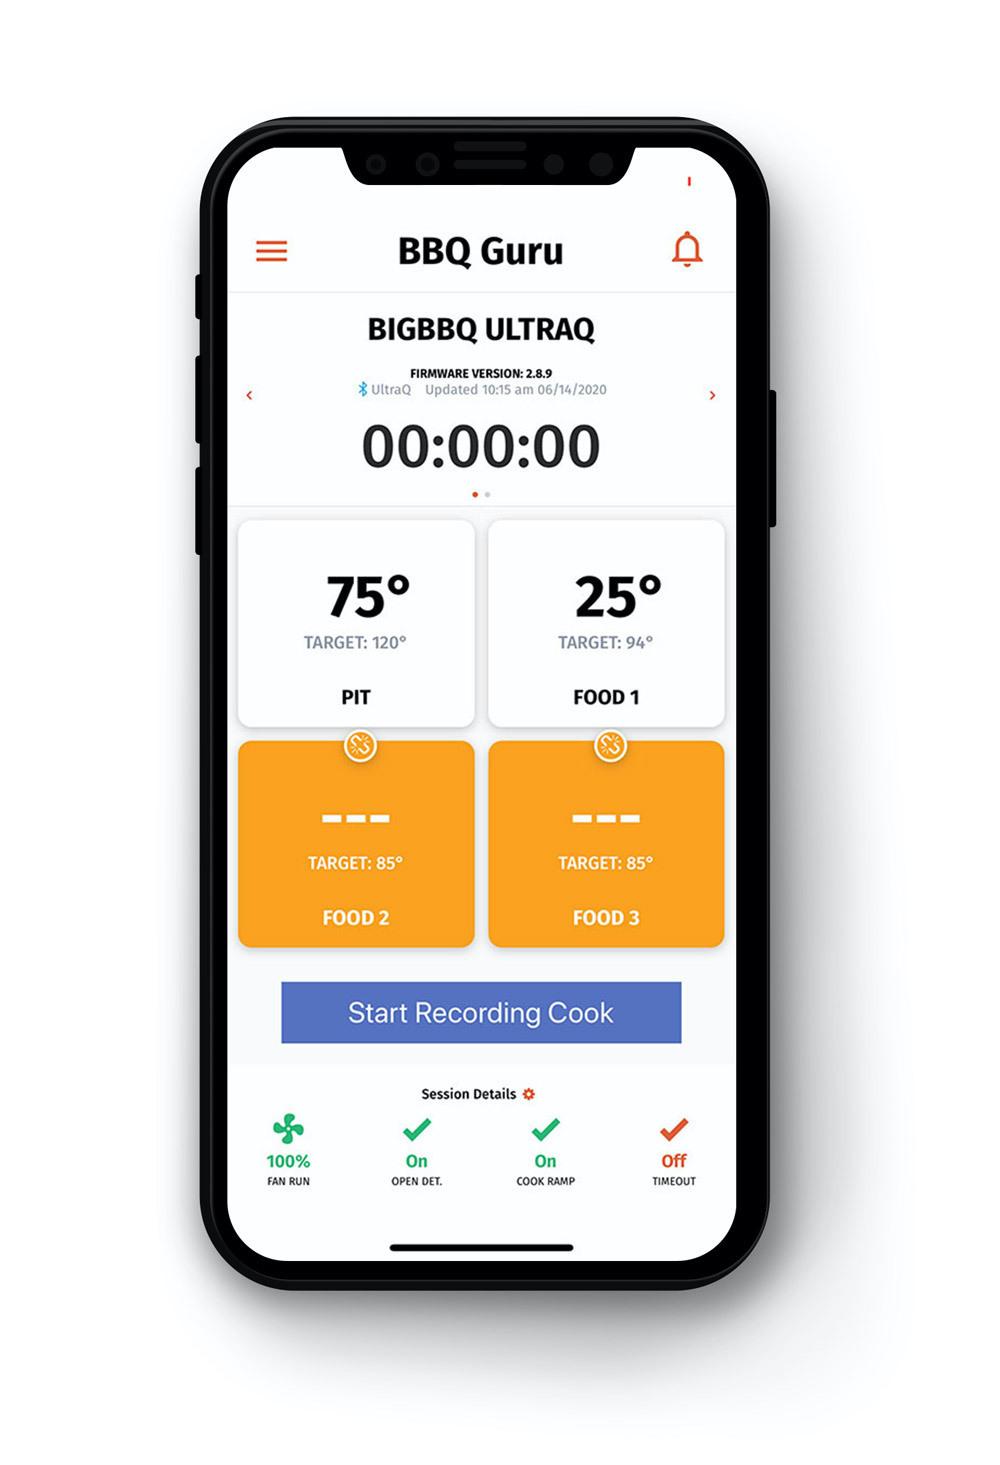 bbq-guru-phone